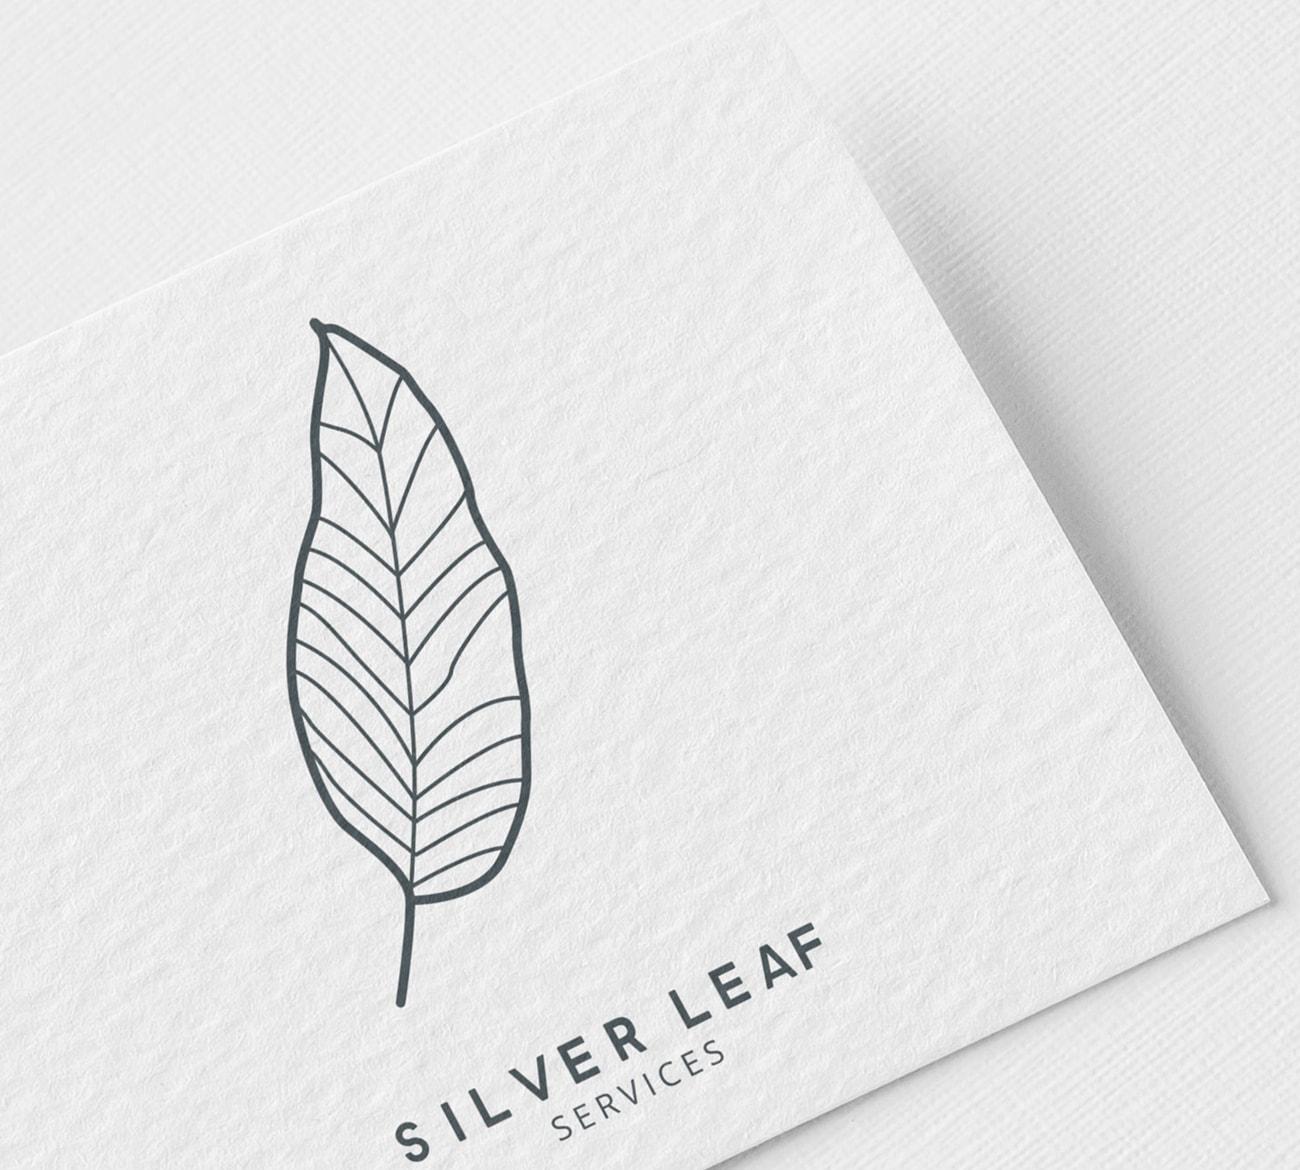 Silver Leaf Services Logo